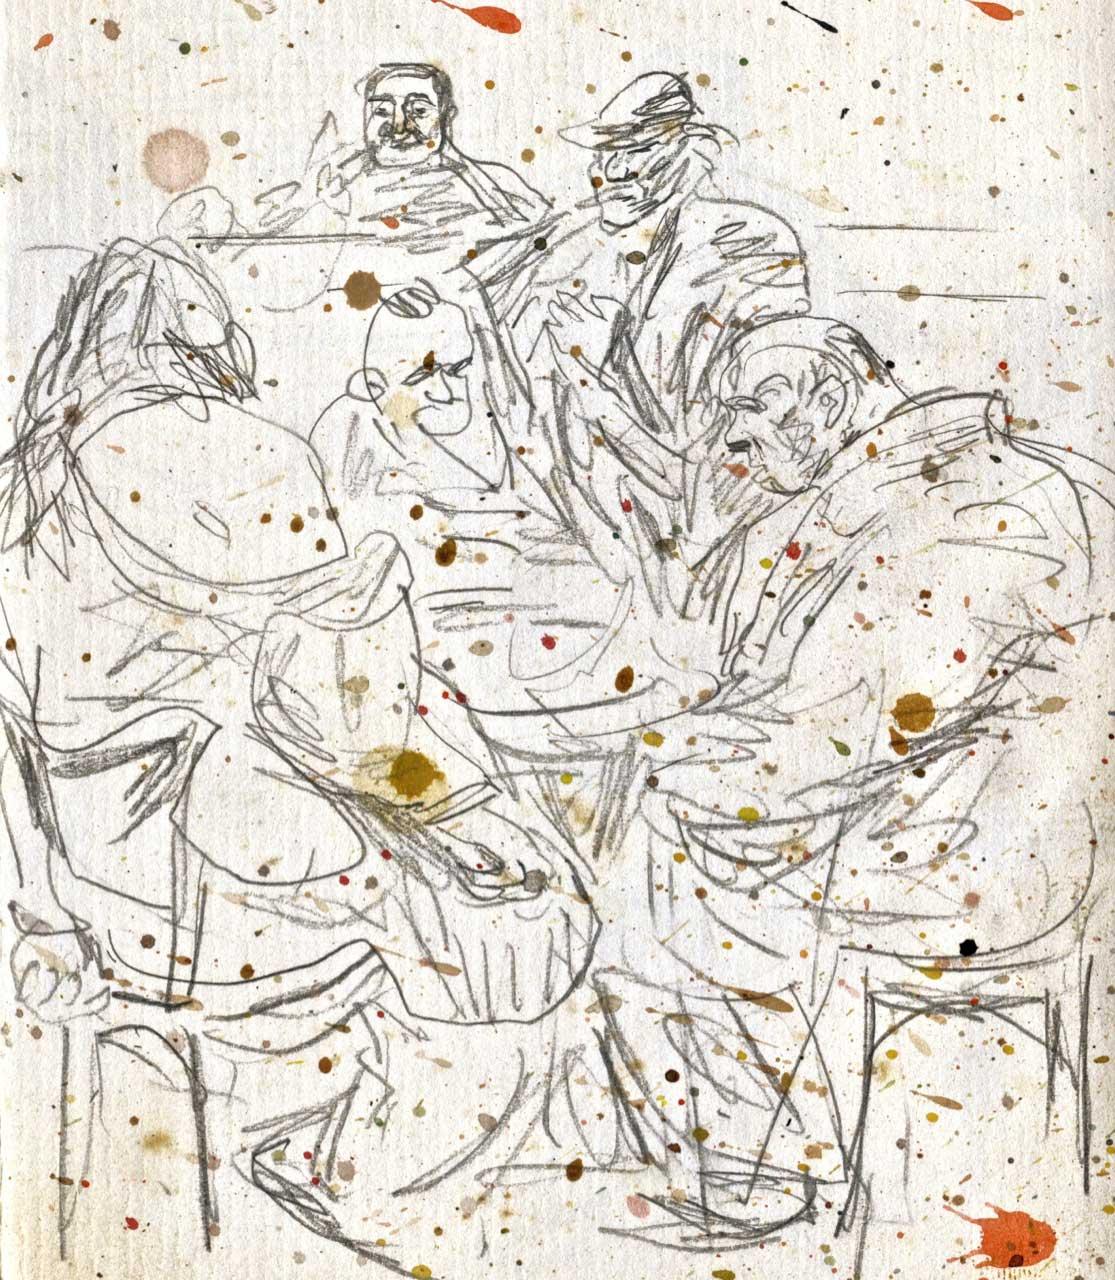 Sketchbook-1990-Barcelona-4